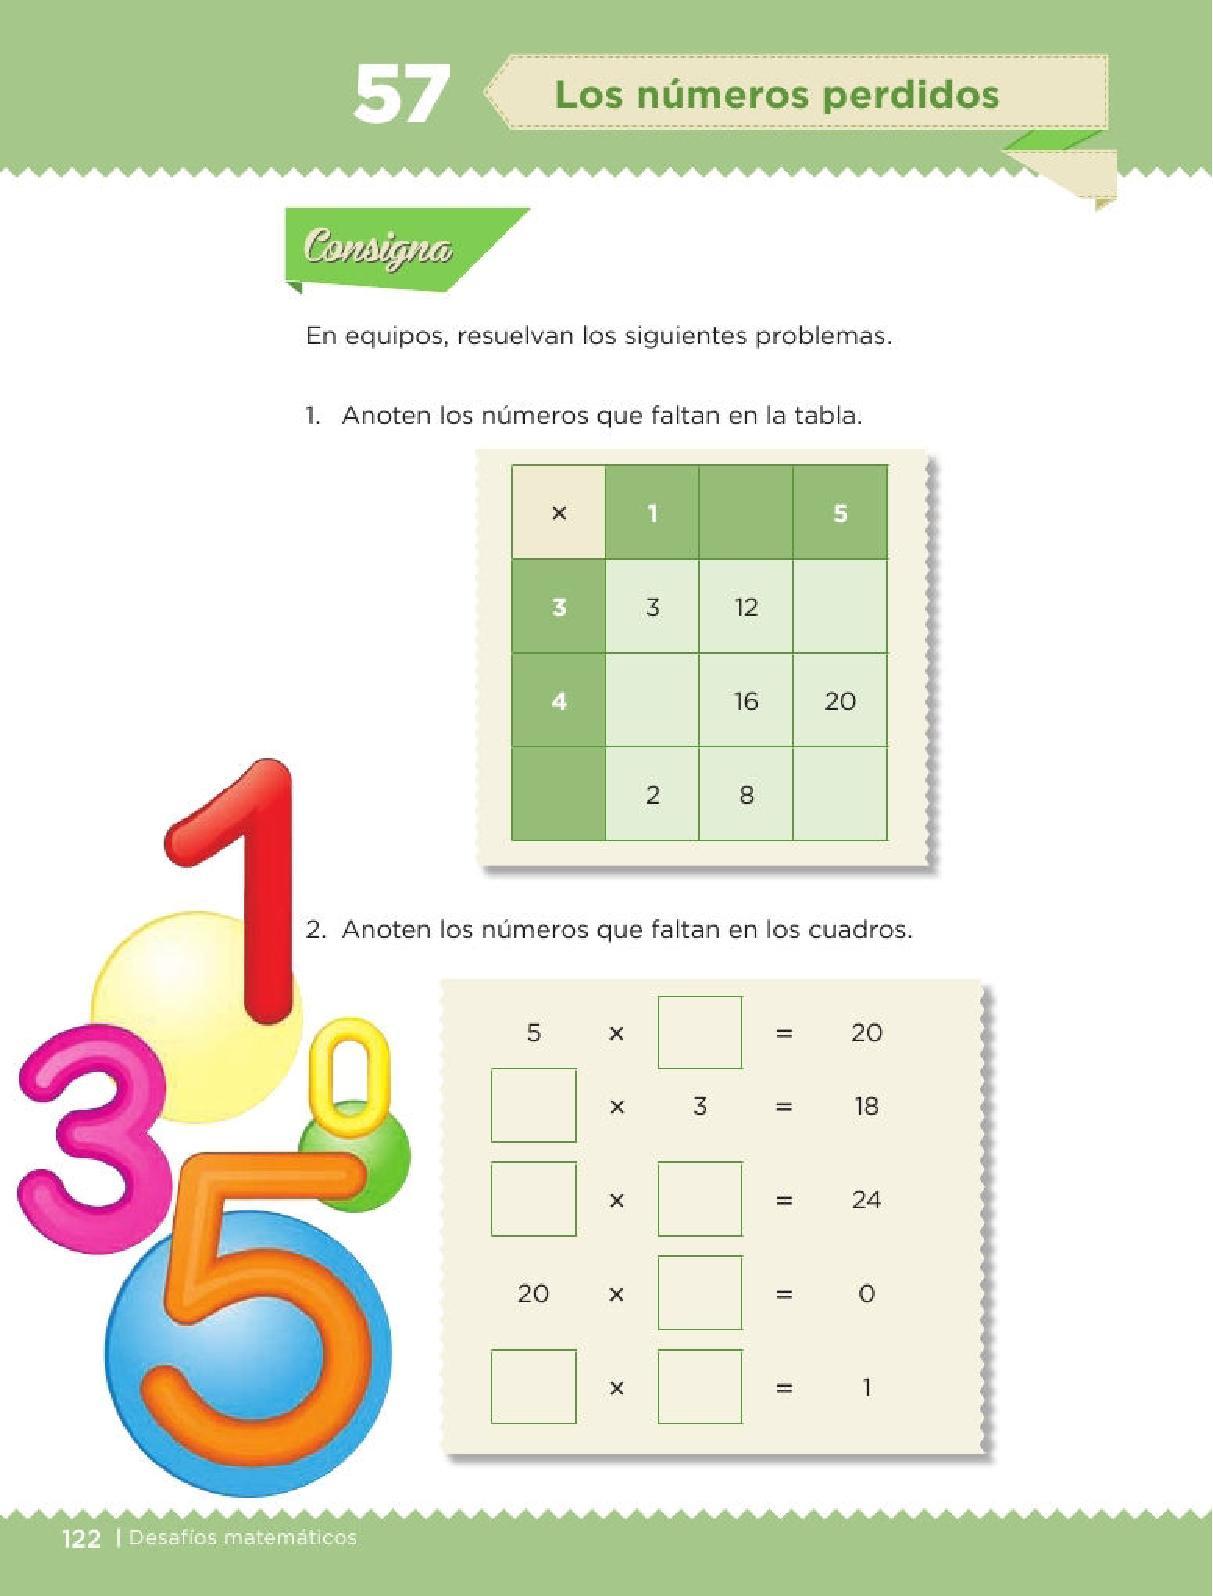 Apoyo Primaria Desafíos matemáticos 3ro Grado Bloque IV Lección 57